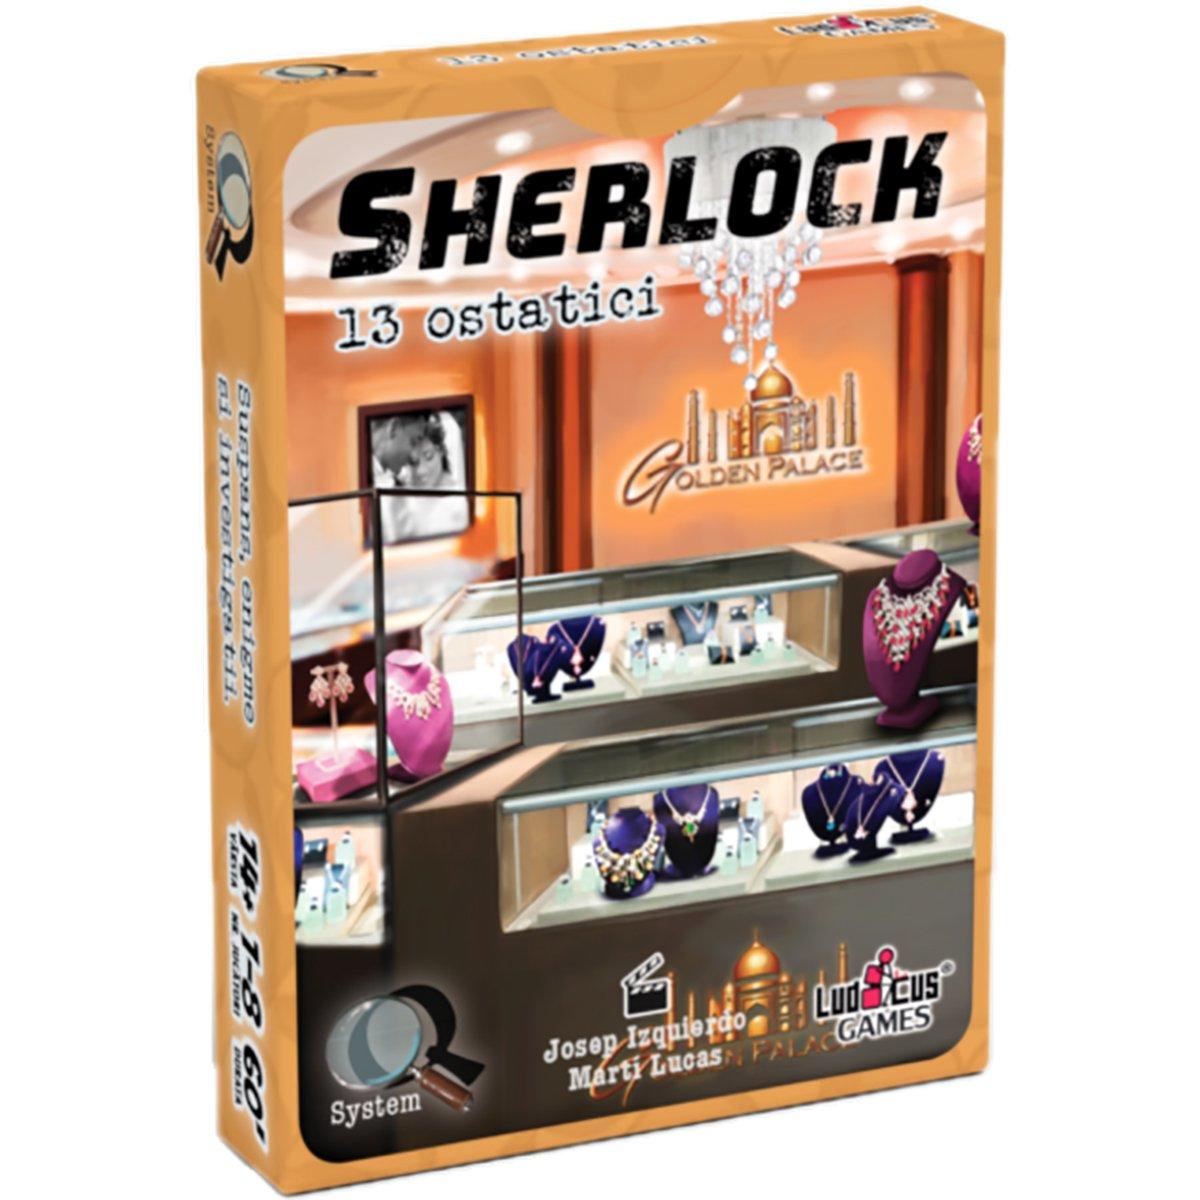 Joc de societate Enigma Studio, Sherlock, Q5 13 ostatici